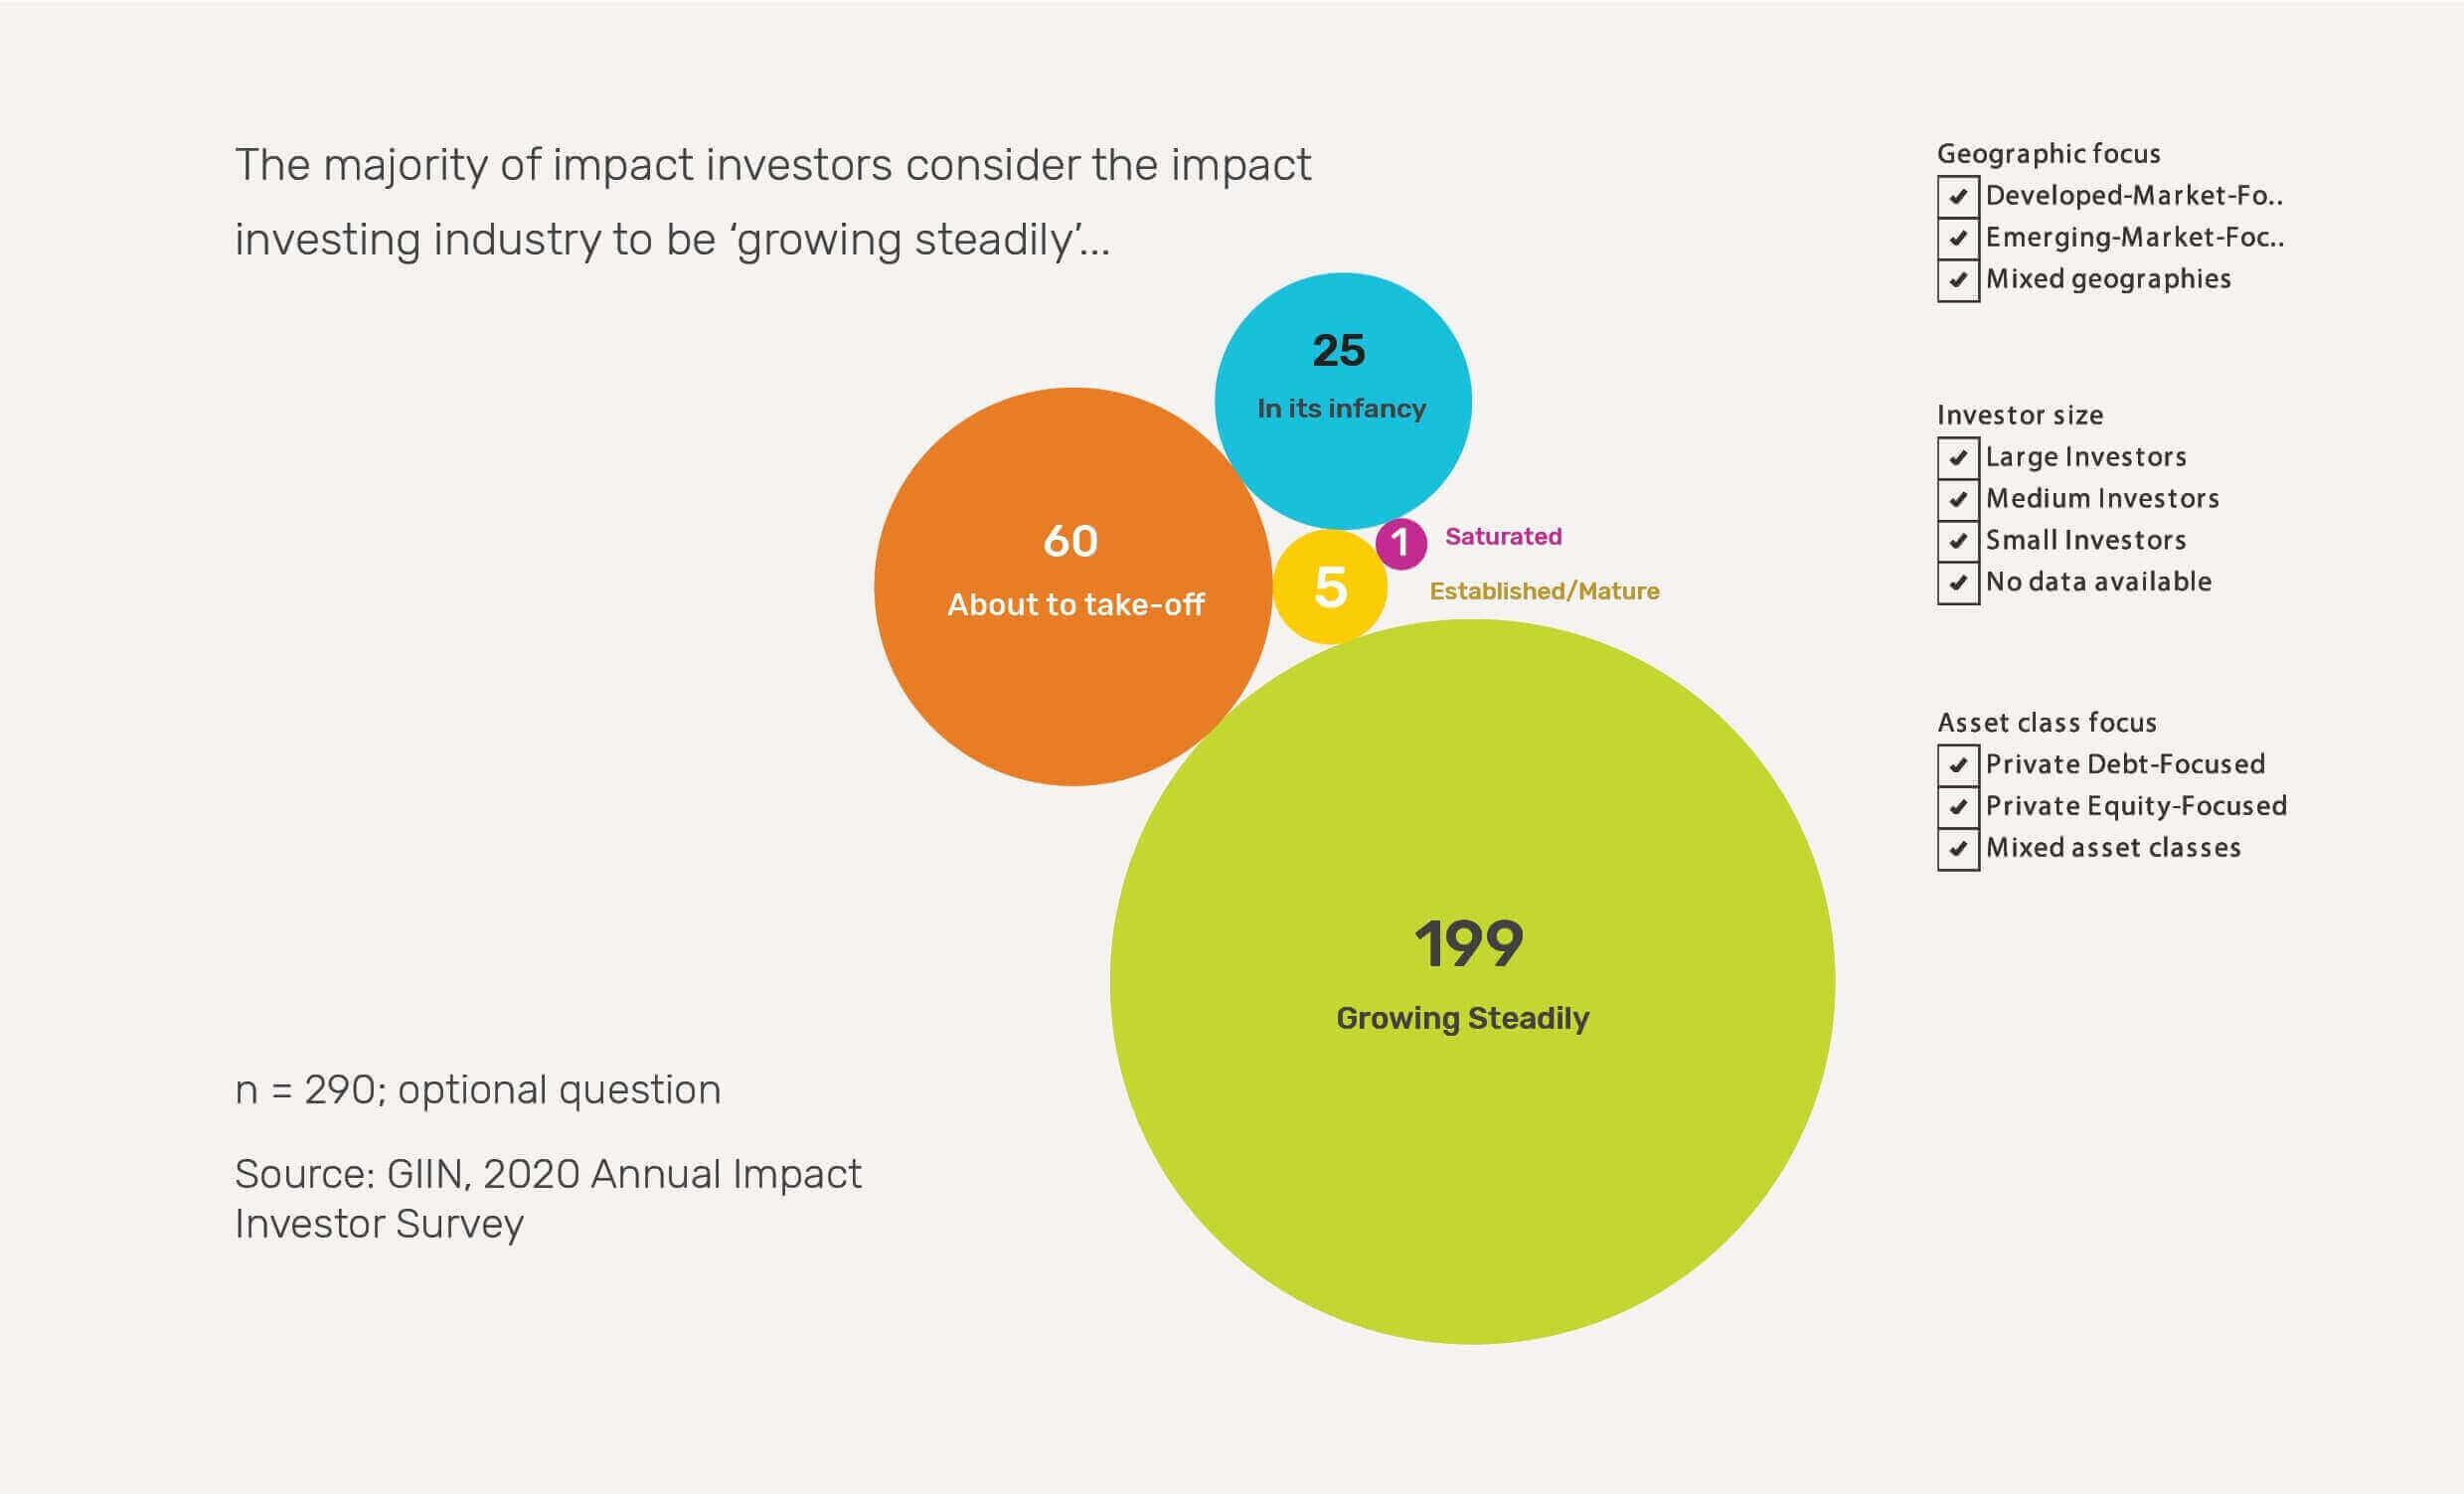 GIIN 2020 Annual Impact Investor Survey (1) (1) (1) (1)